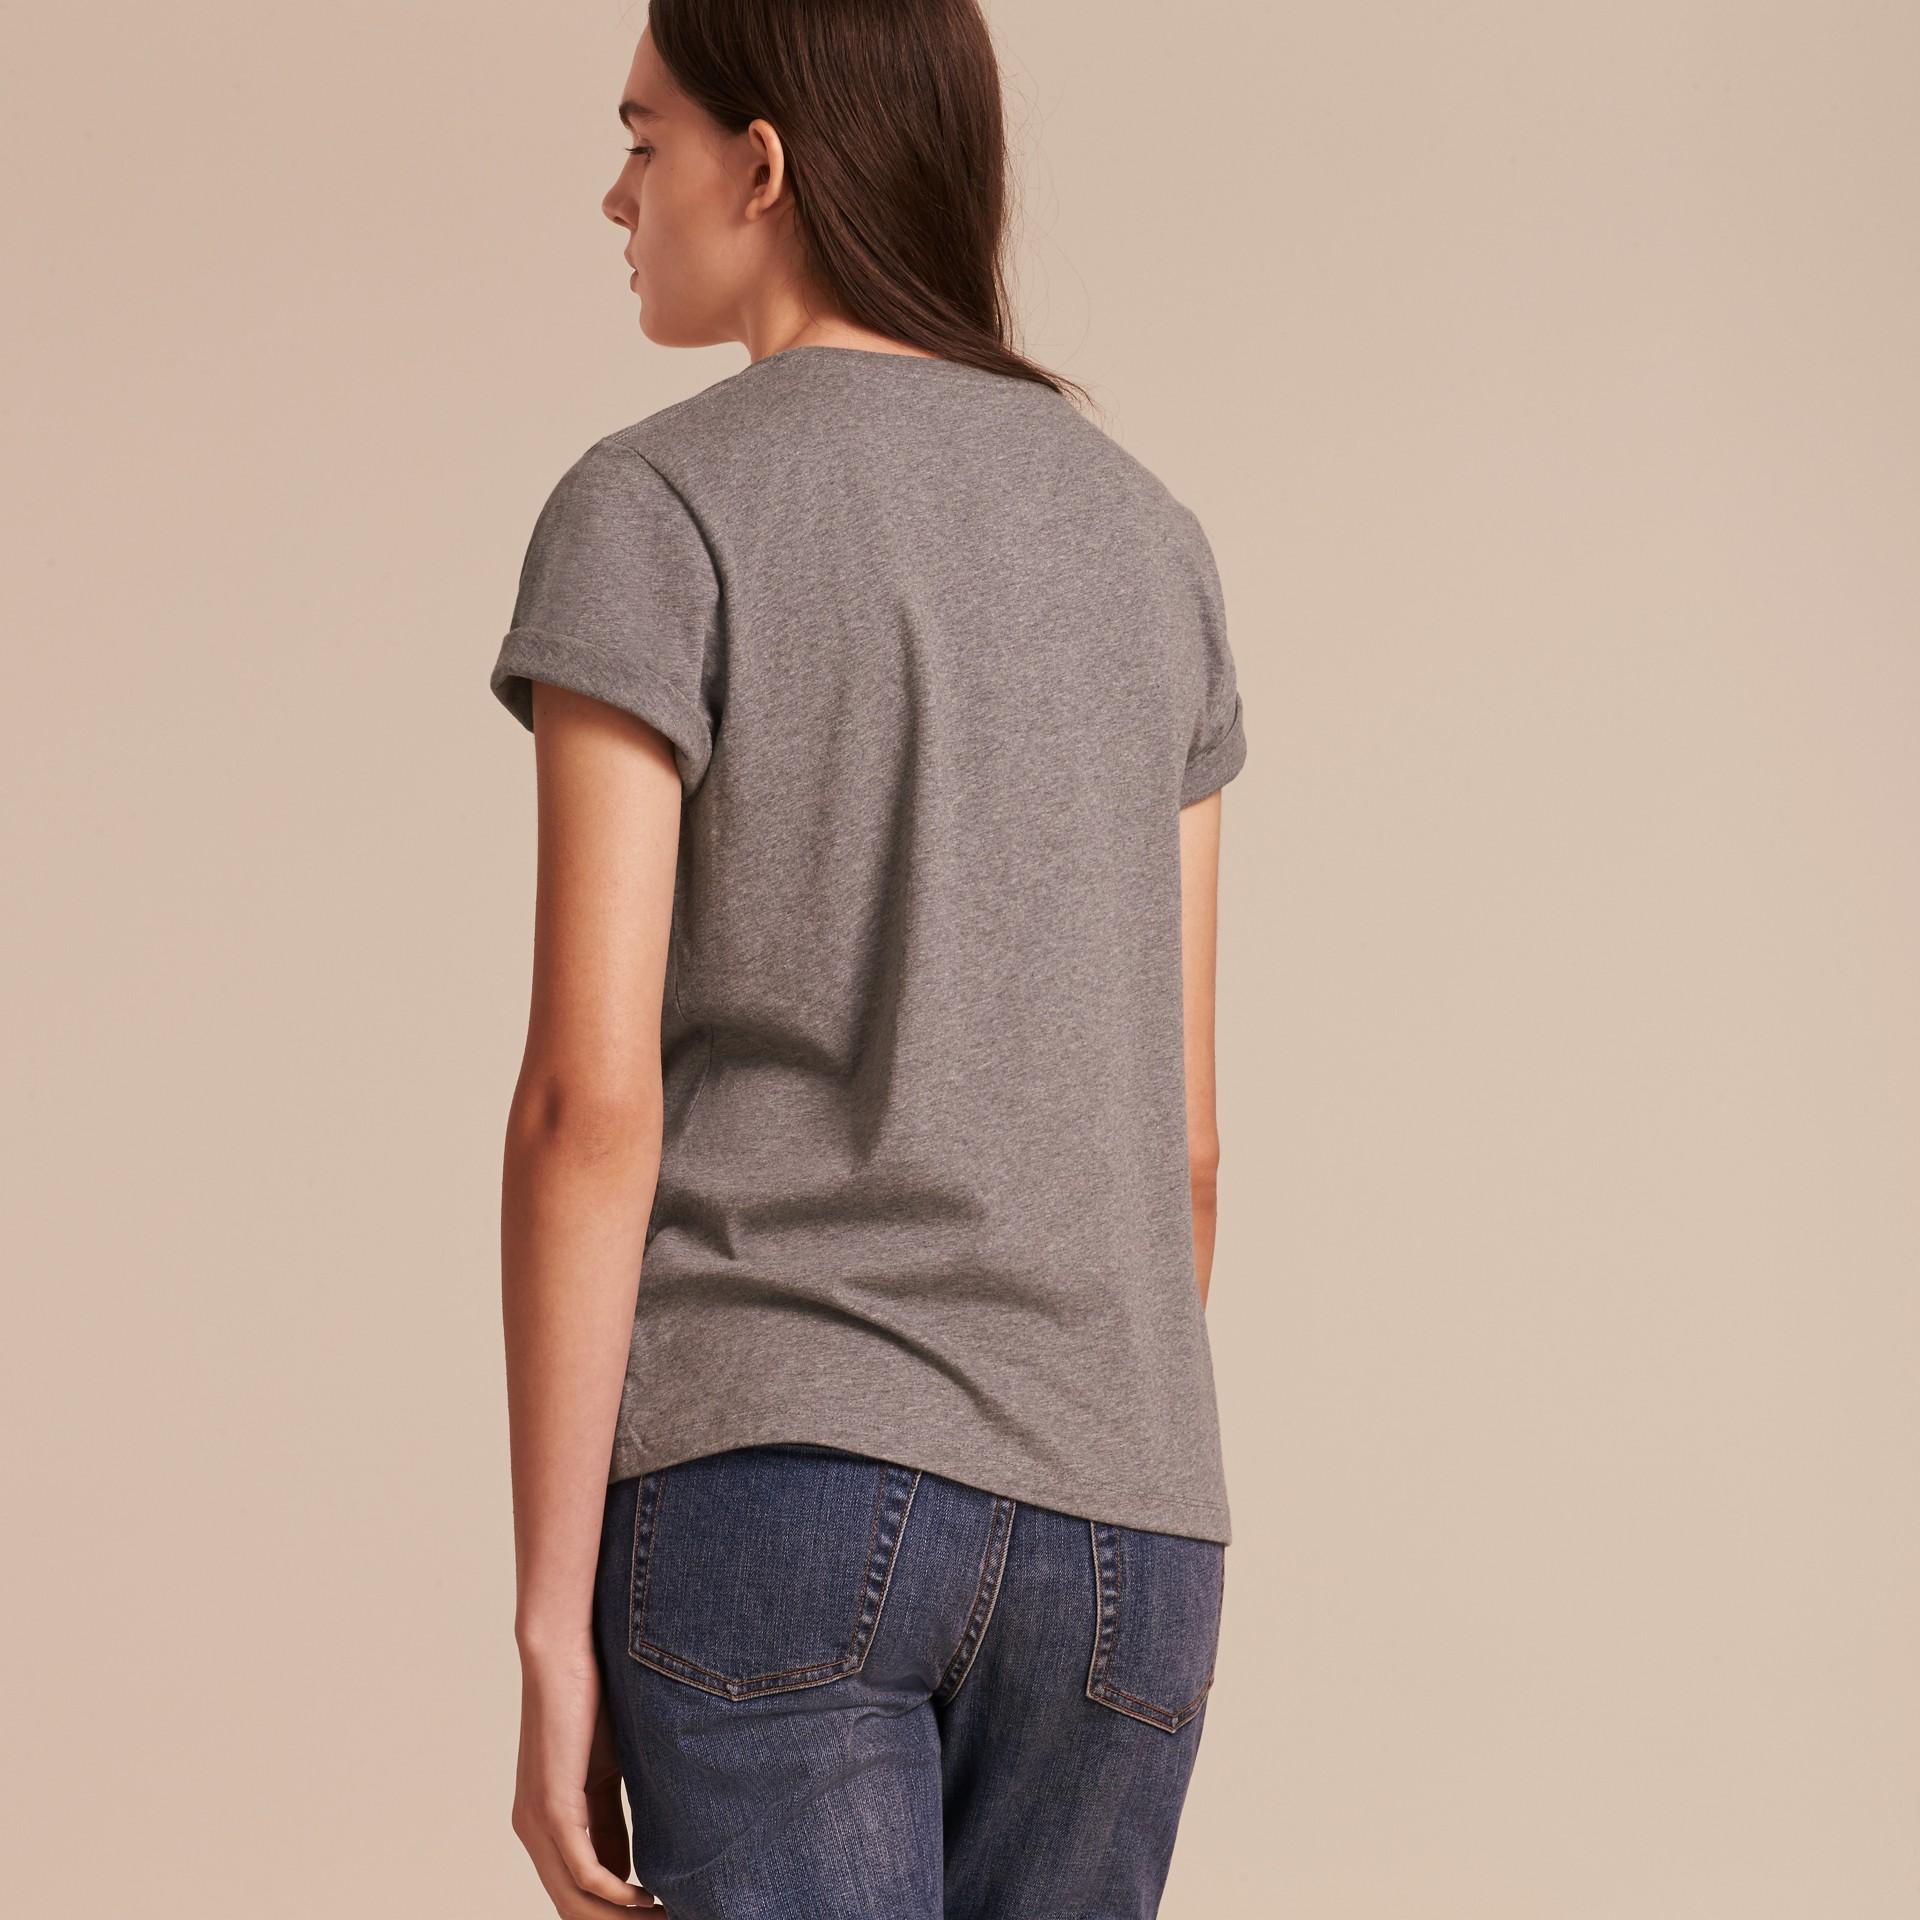 Appliquéd Weather Motif Cotton T-shirt Mid Grey Melange - gallery image 3